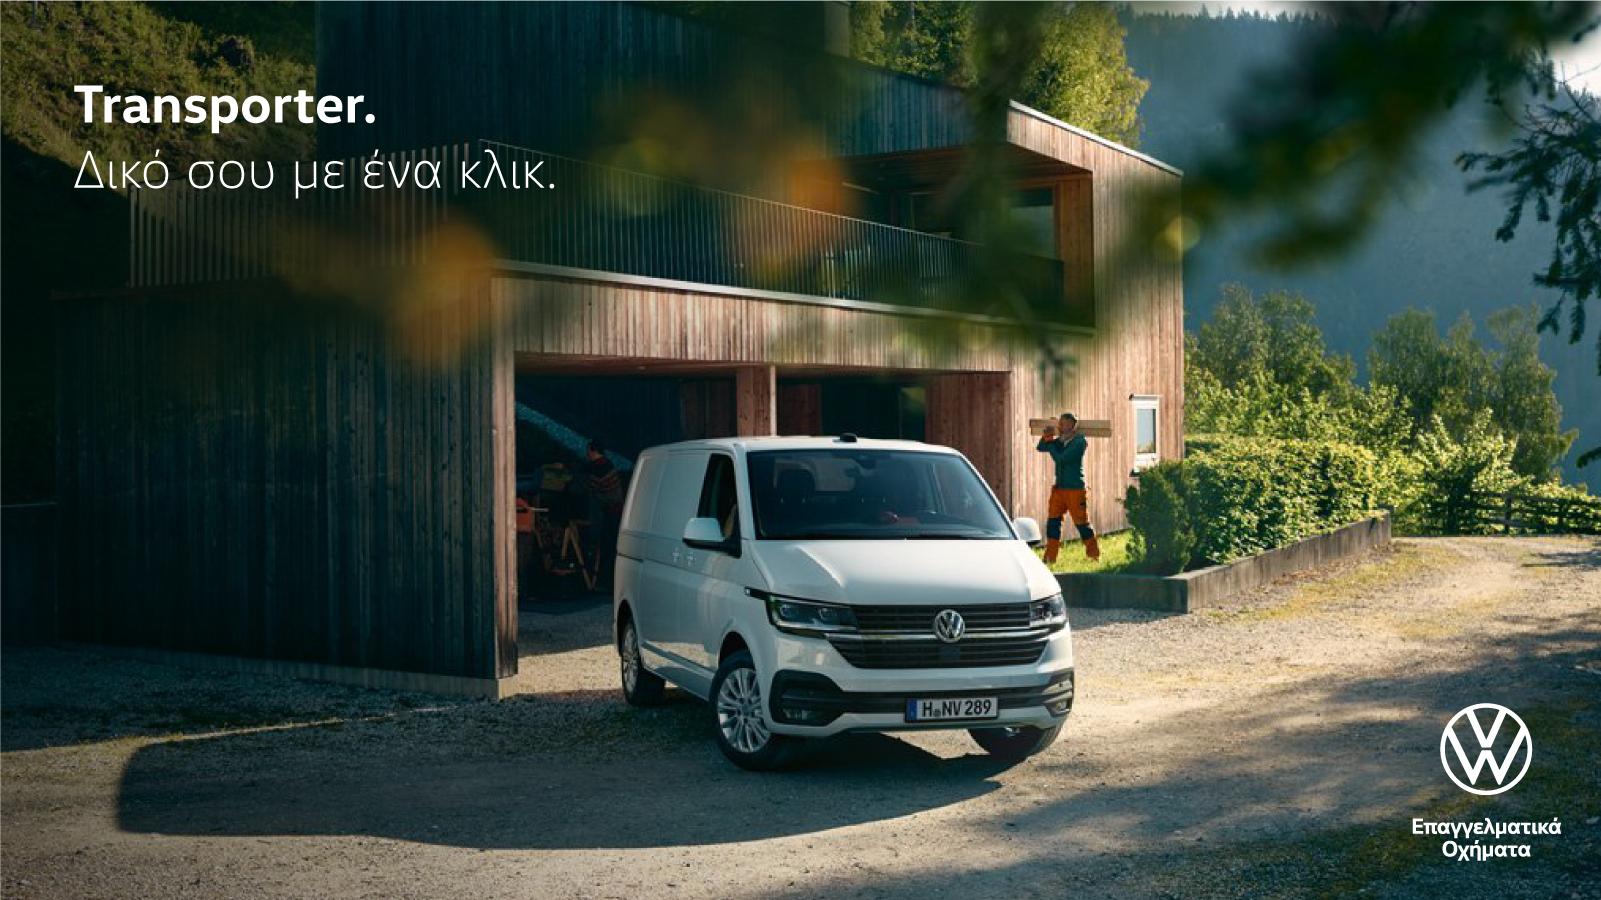 Mycarnow Kosmocar - Volkswagen Transporter δικό σου με ένα κλικ